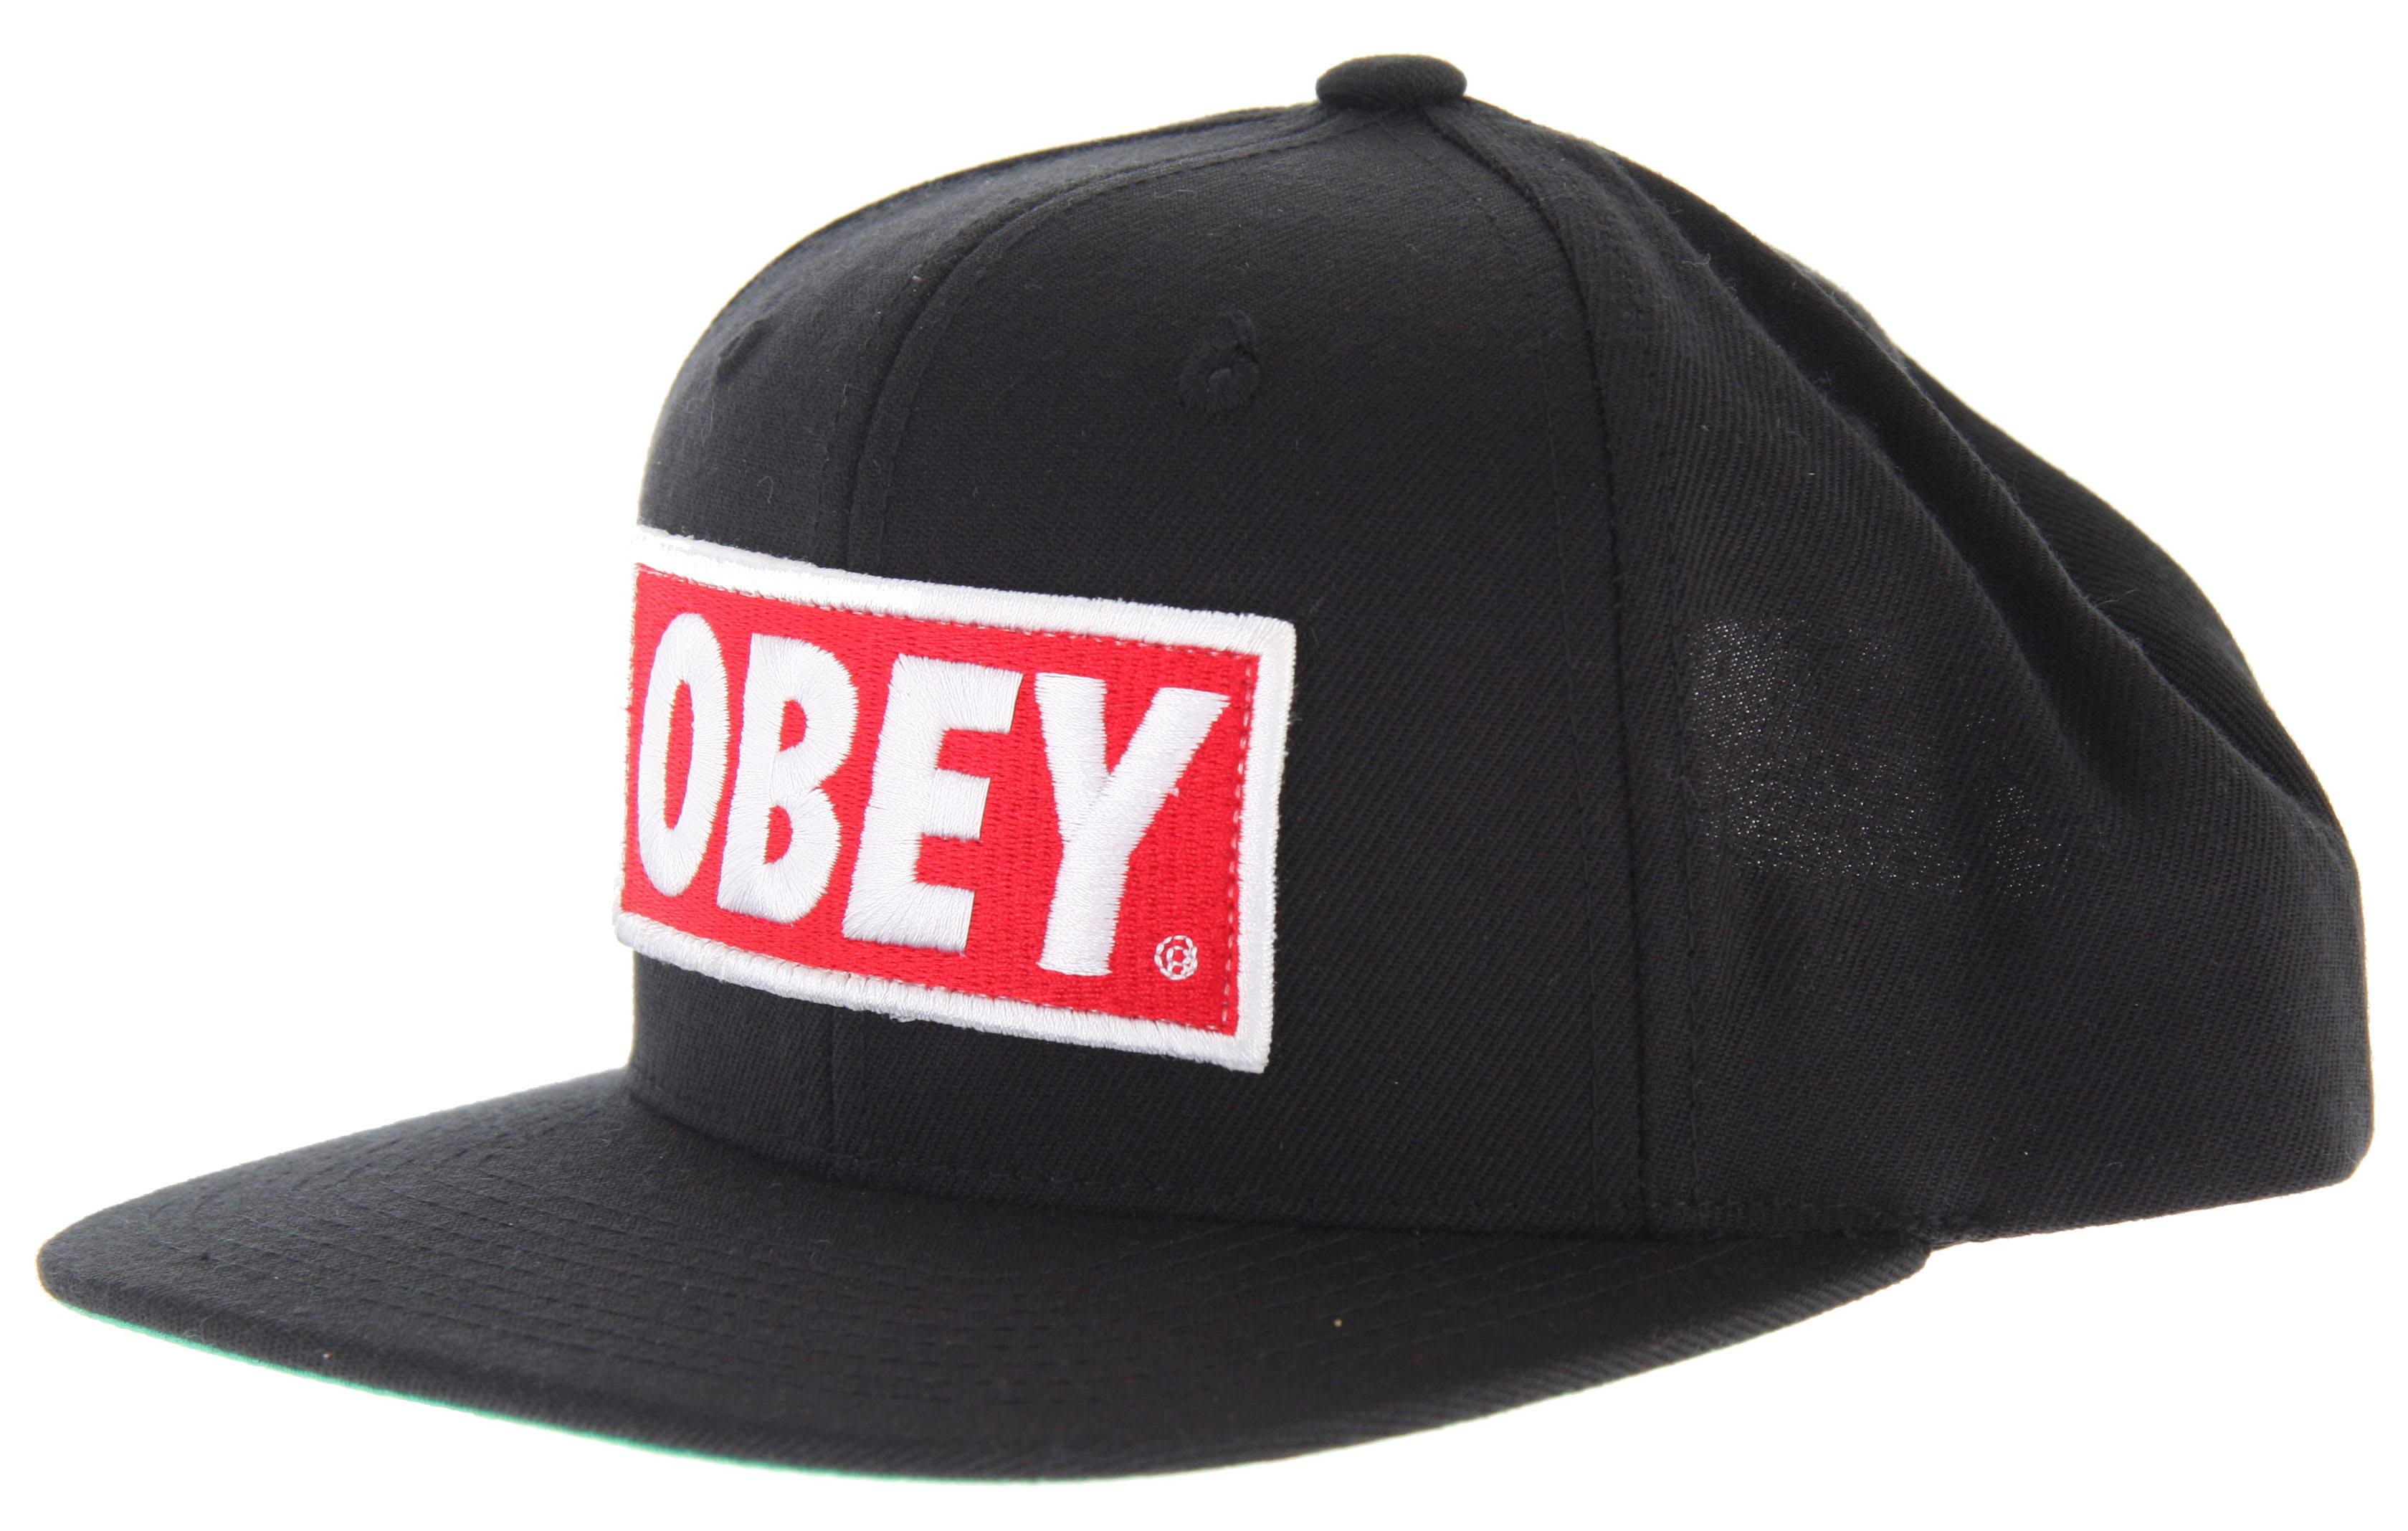 Nike Hat White Original Obey